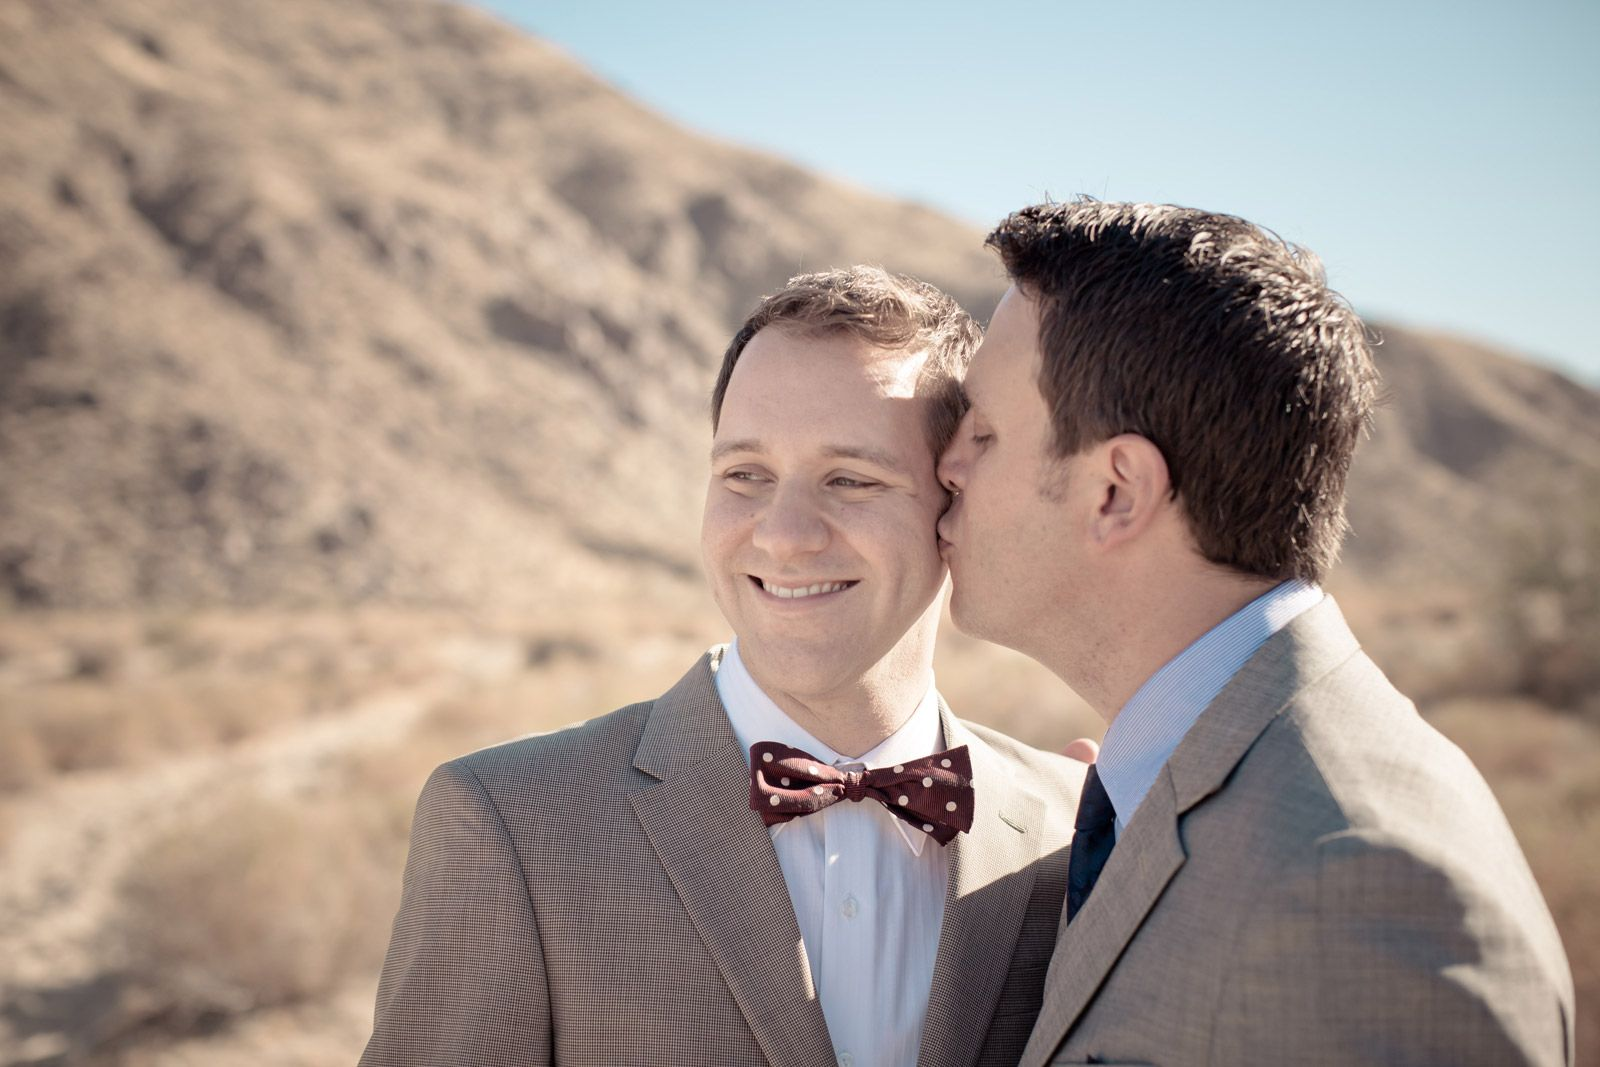 Paul and Nick's Wedding Day | Ace Hotel Palm Springs, CA | TheLongHaulPhoto.com | Wedding Photographers LA + San Diego